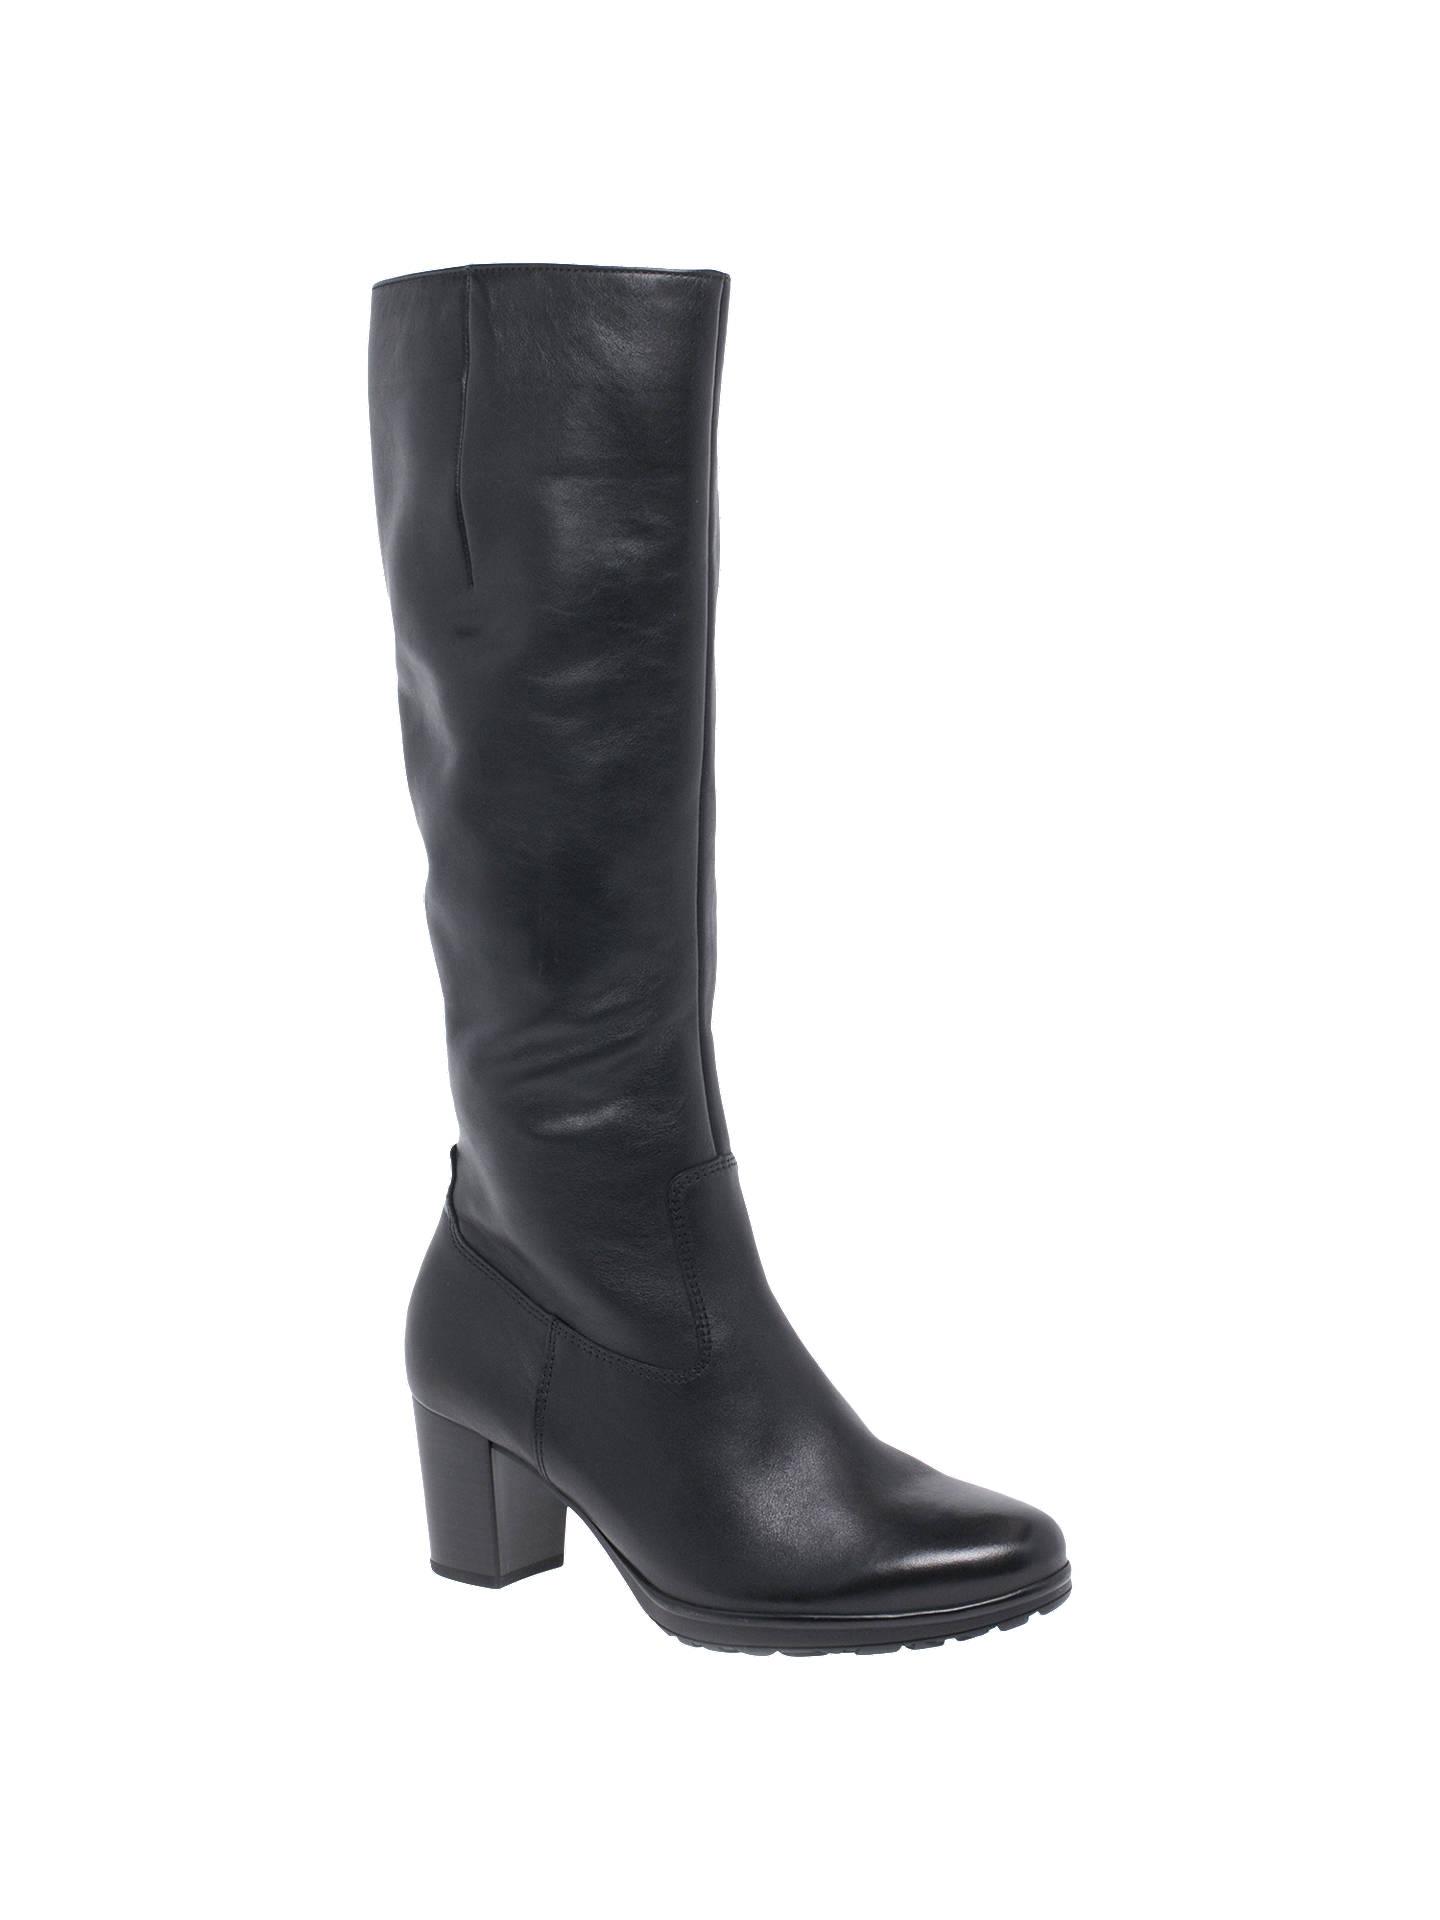 ad3c23fd01b Buy Gabor Hillary Medium Fit Knee High Boots